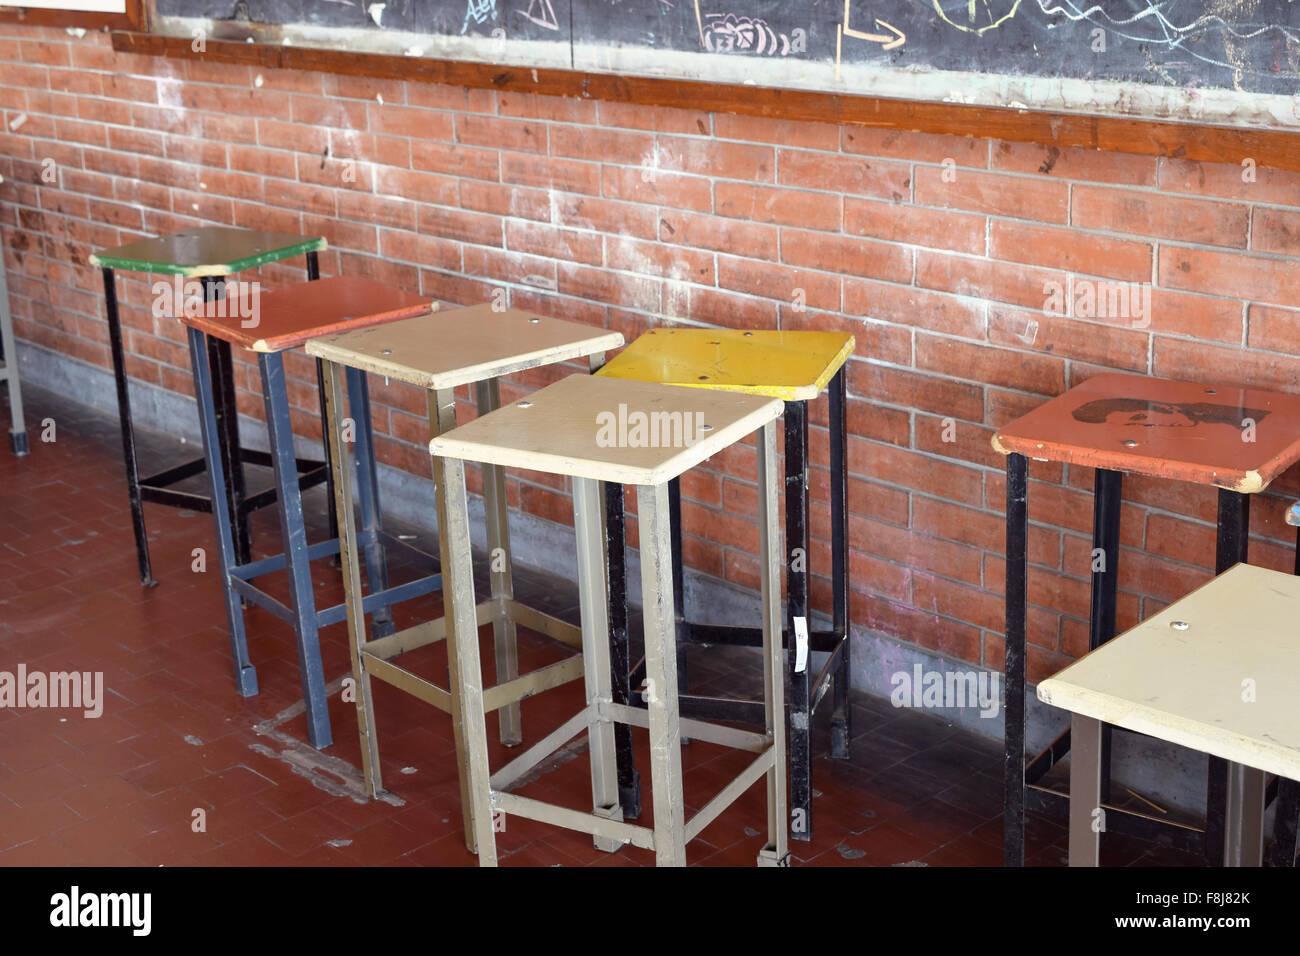 Vecchie sedie per bar in una scuola d arte alte sedie e sgabelli